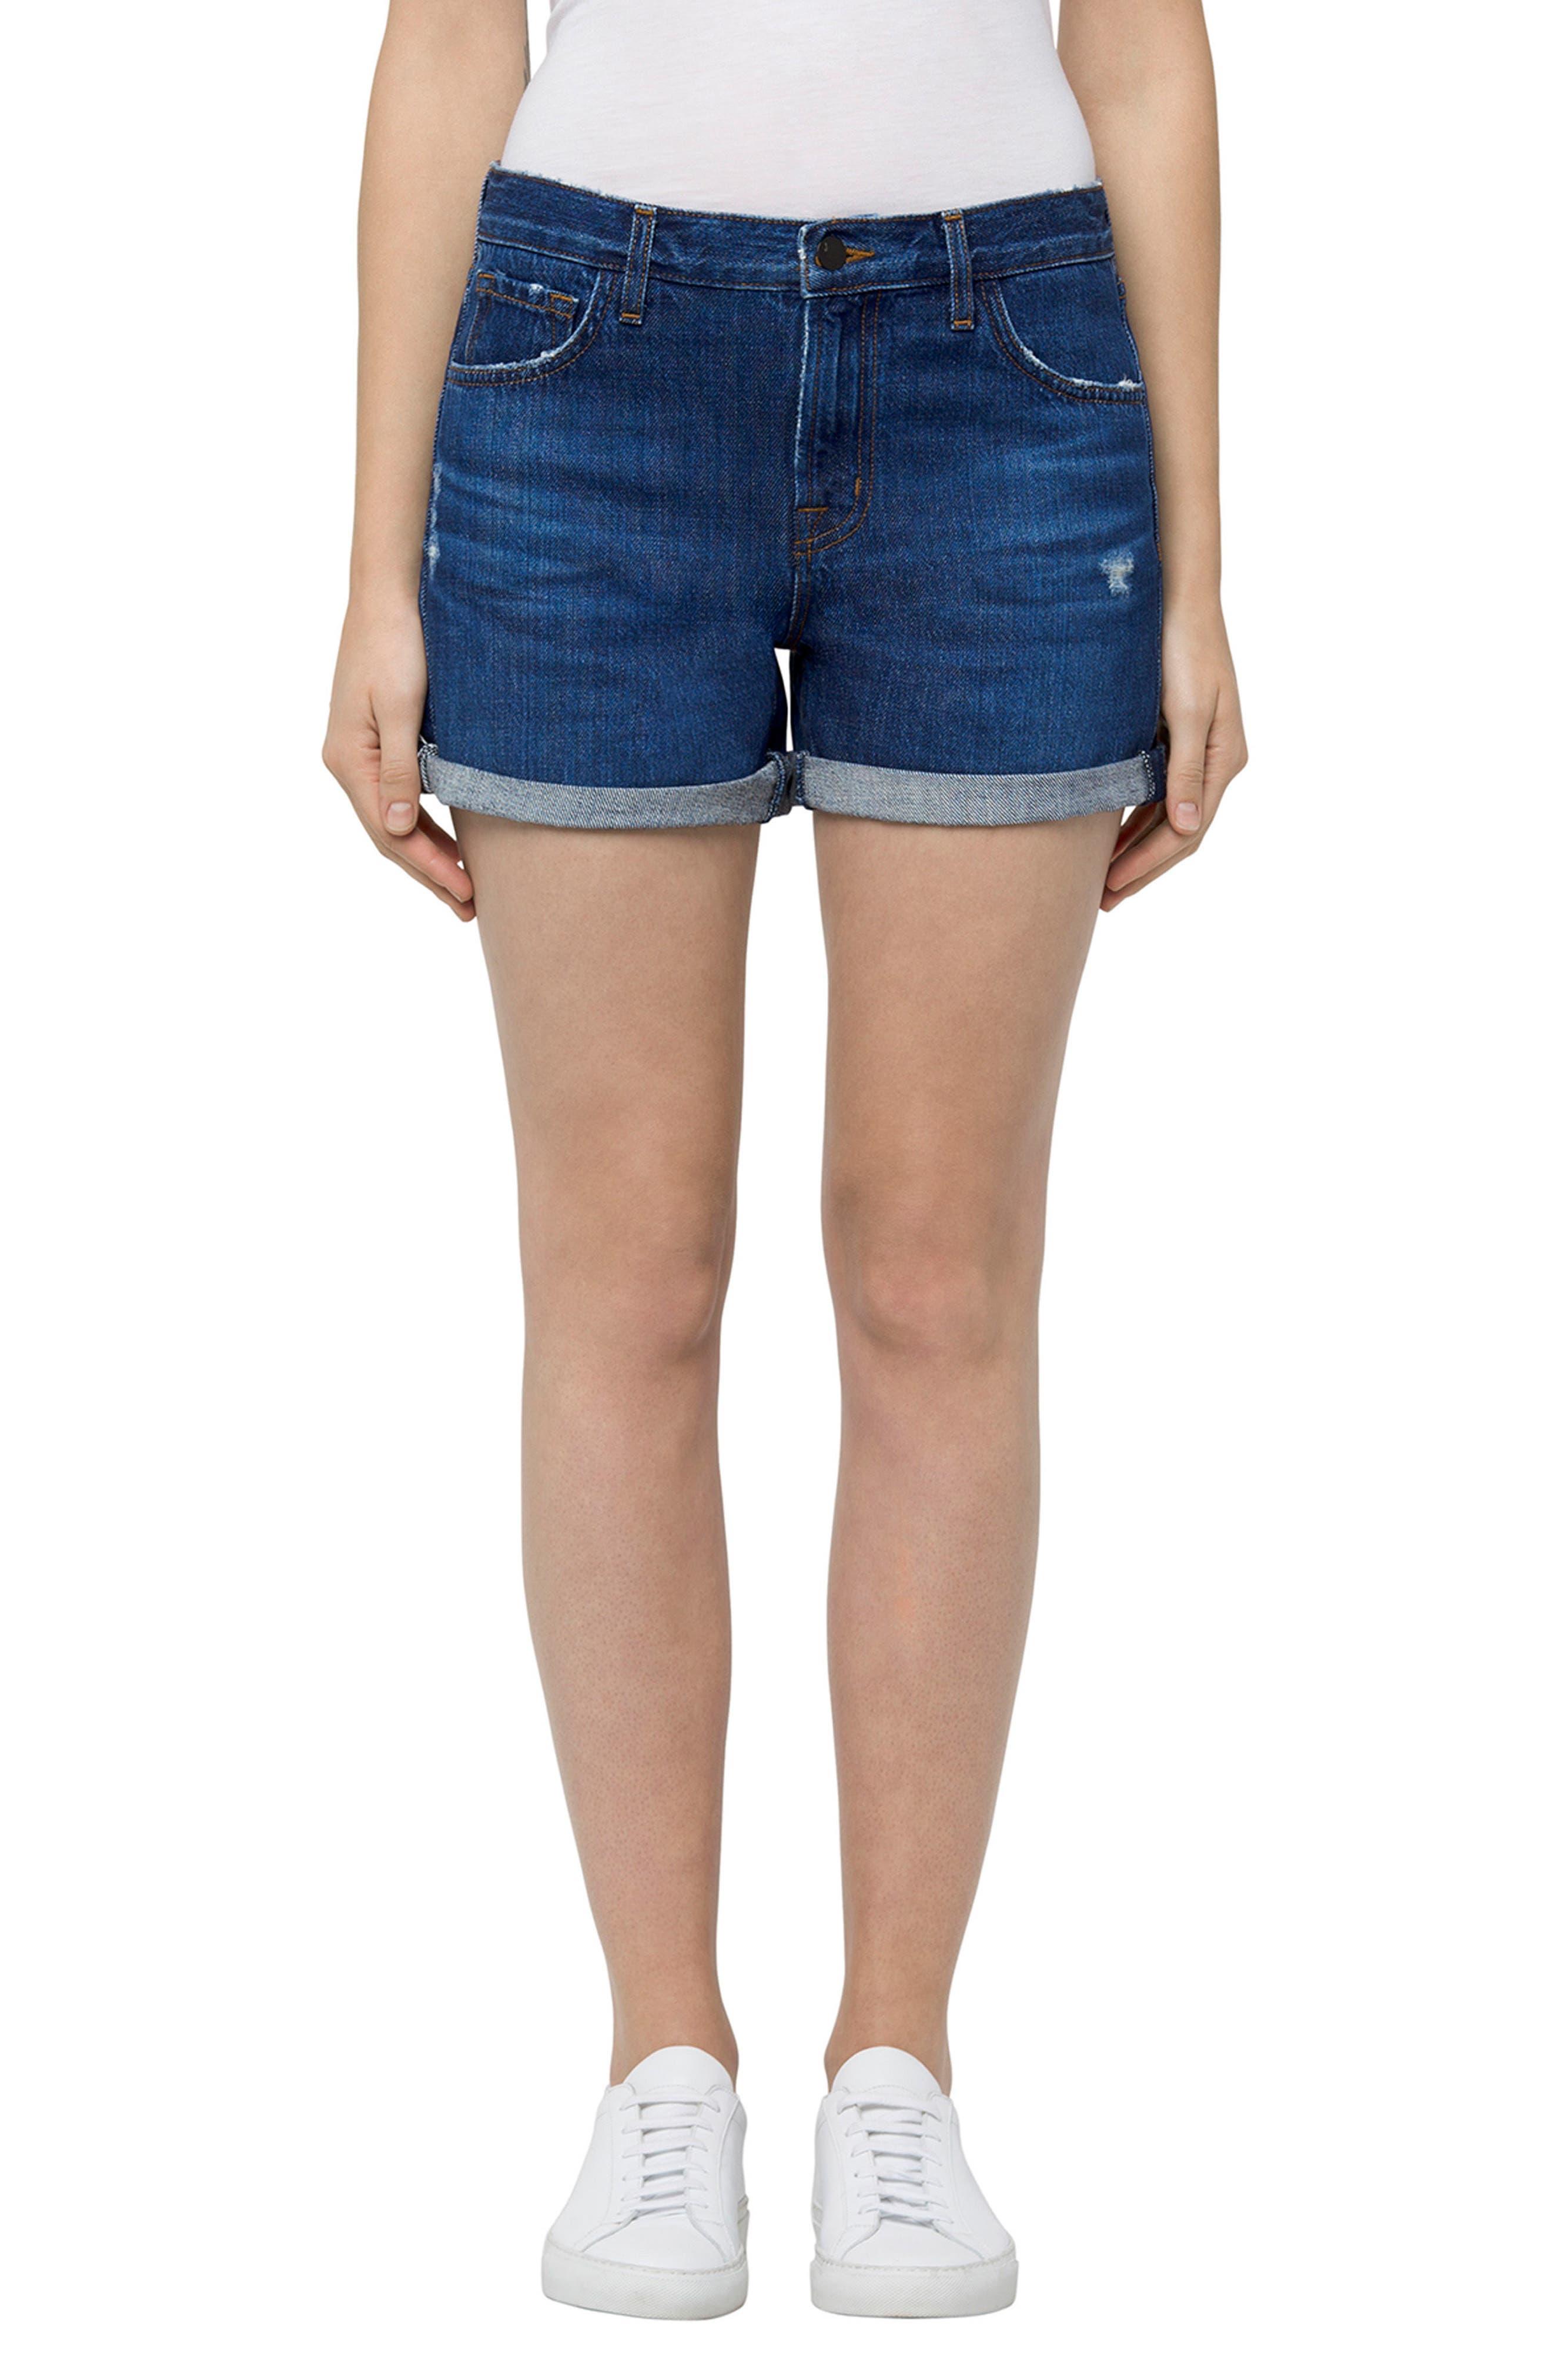 Alternate Image 1 Selected - J Brand Johnny Denim Shorts (Doubletake)